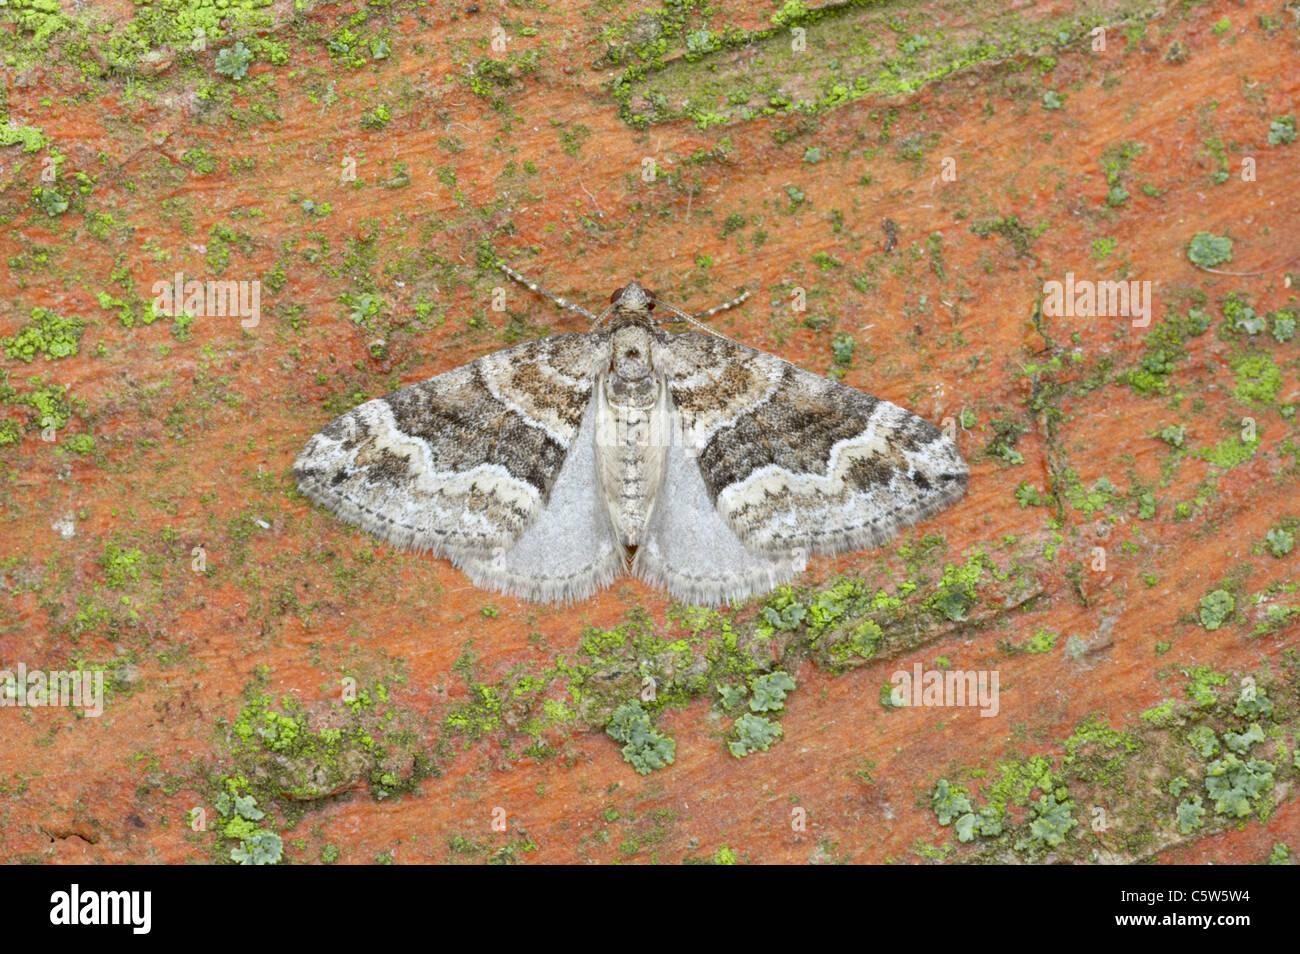 Barred Rivulet Perizoma bifasciata Essex, UK IN000738 - Stock Image